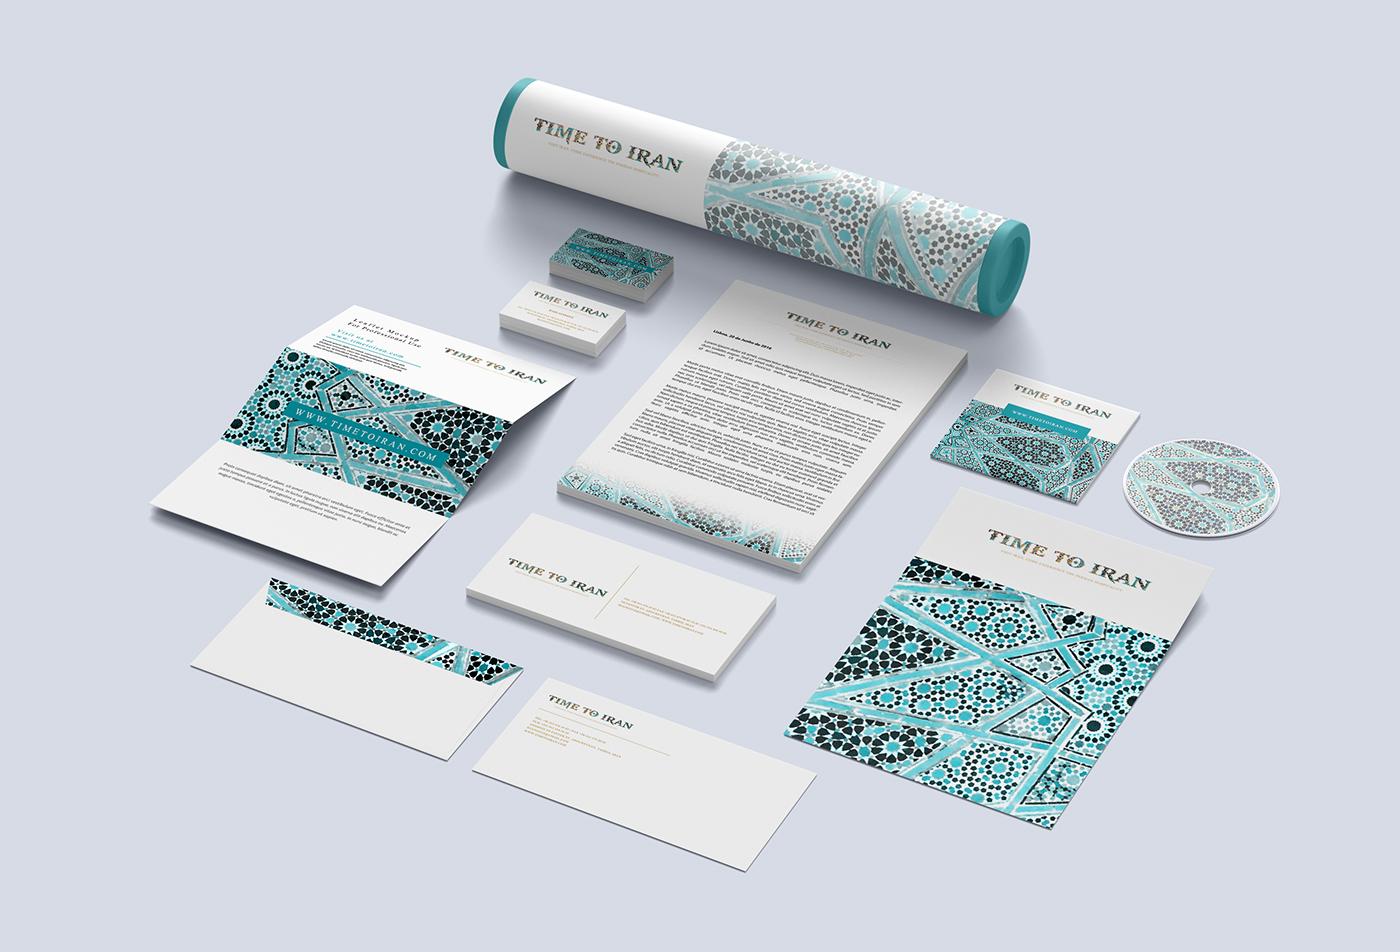 time to iran branding  Stationery graphic design